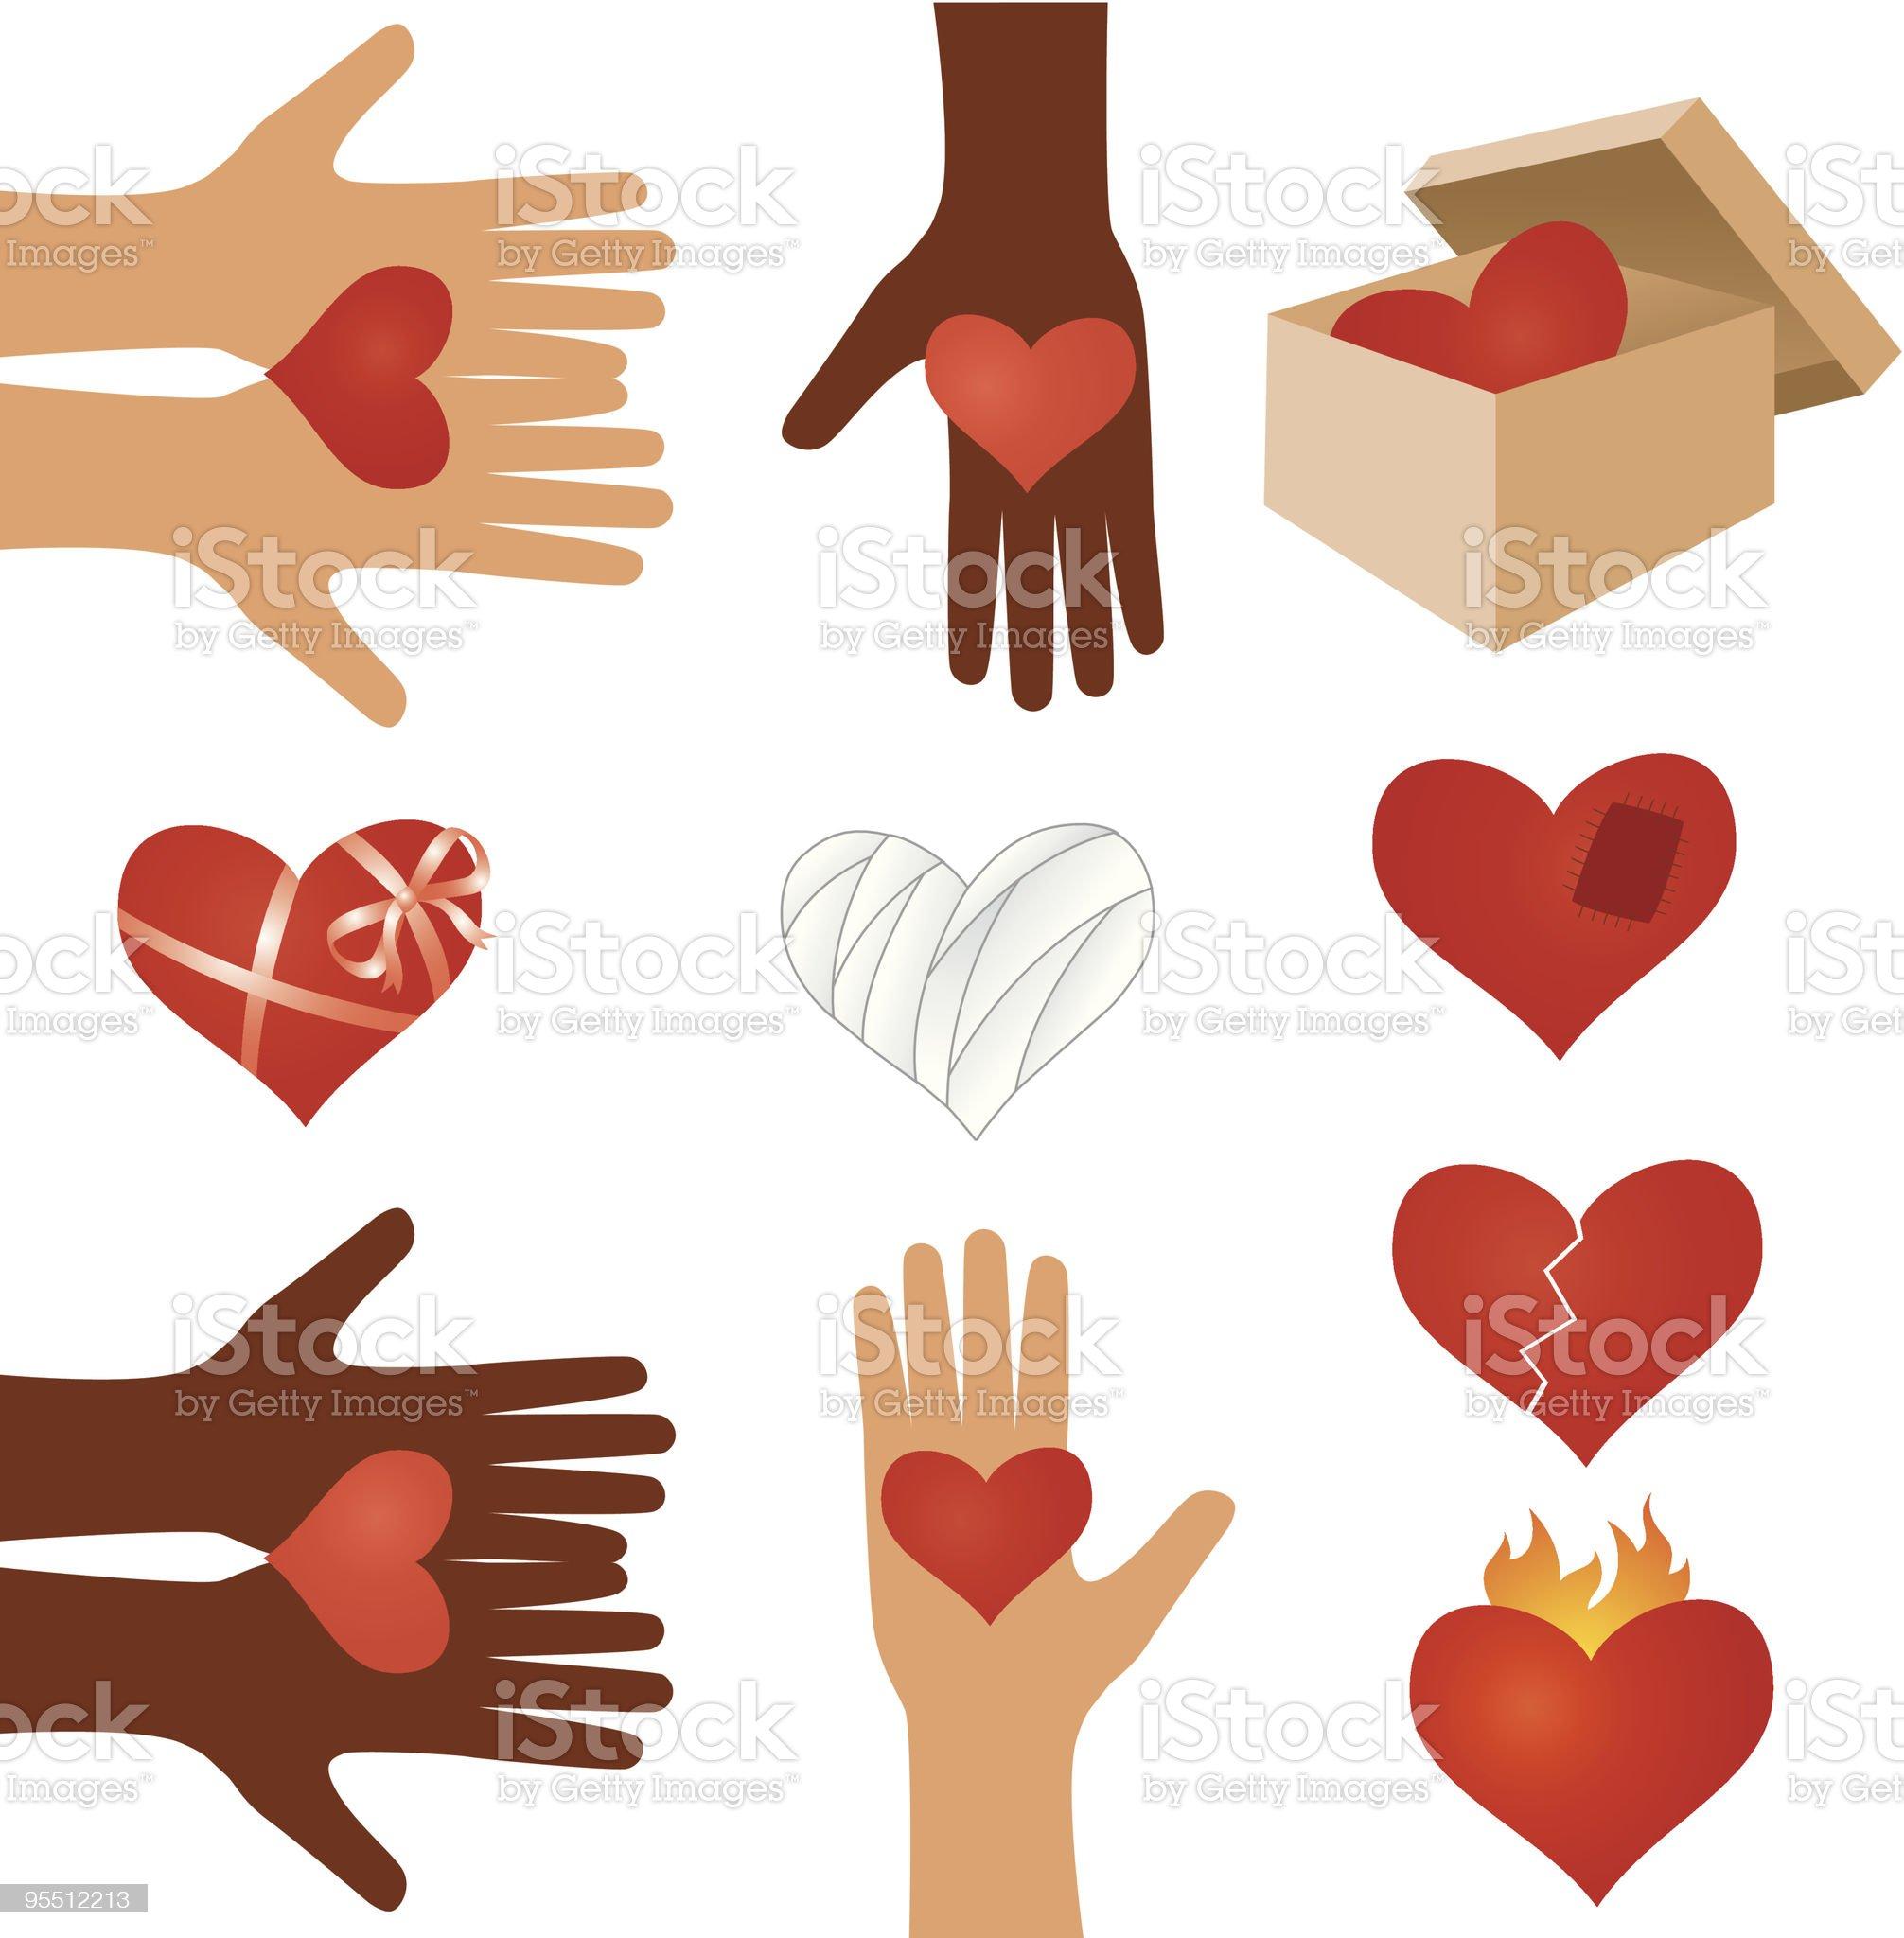 Hearts set royalty-free stock vector art